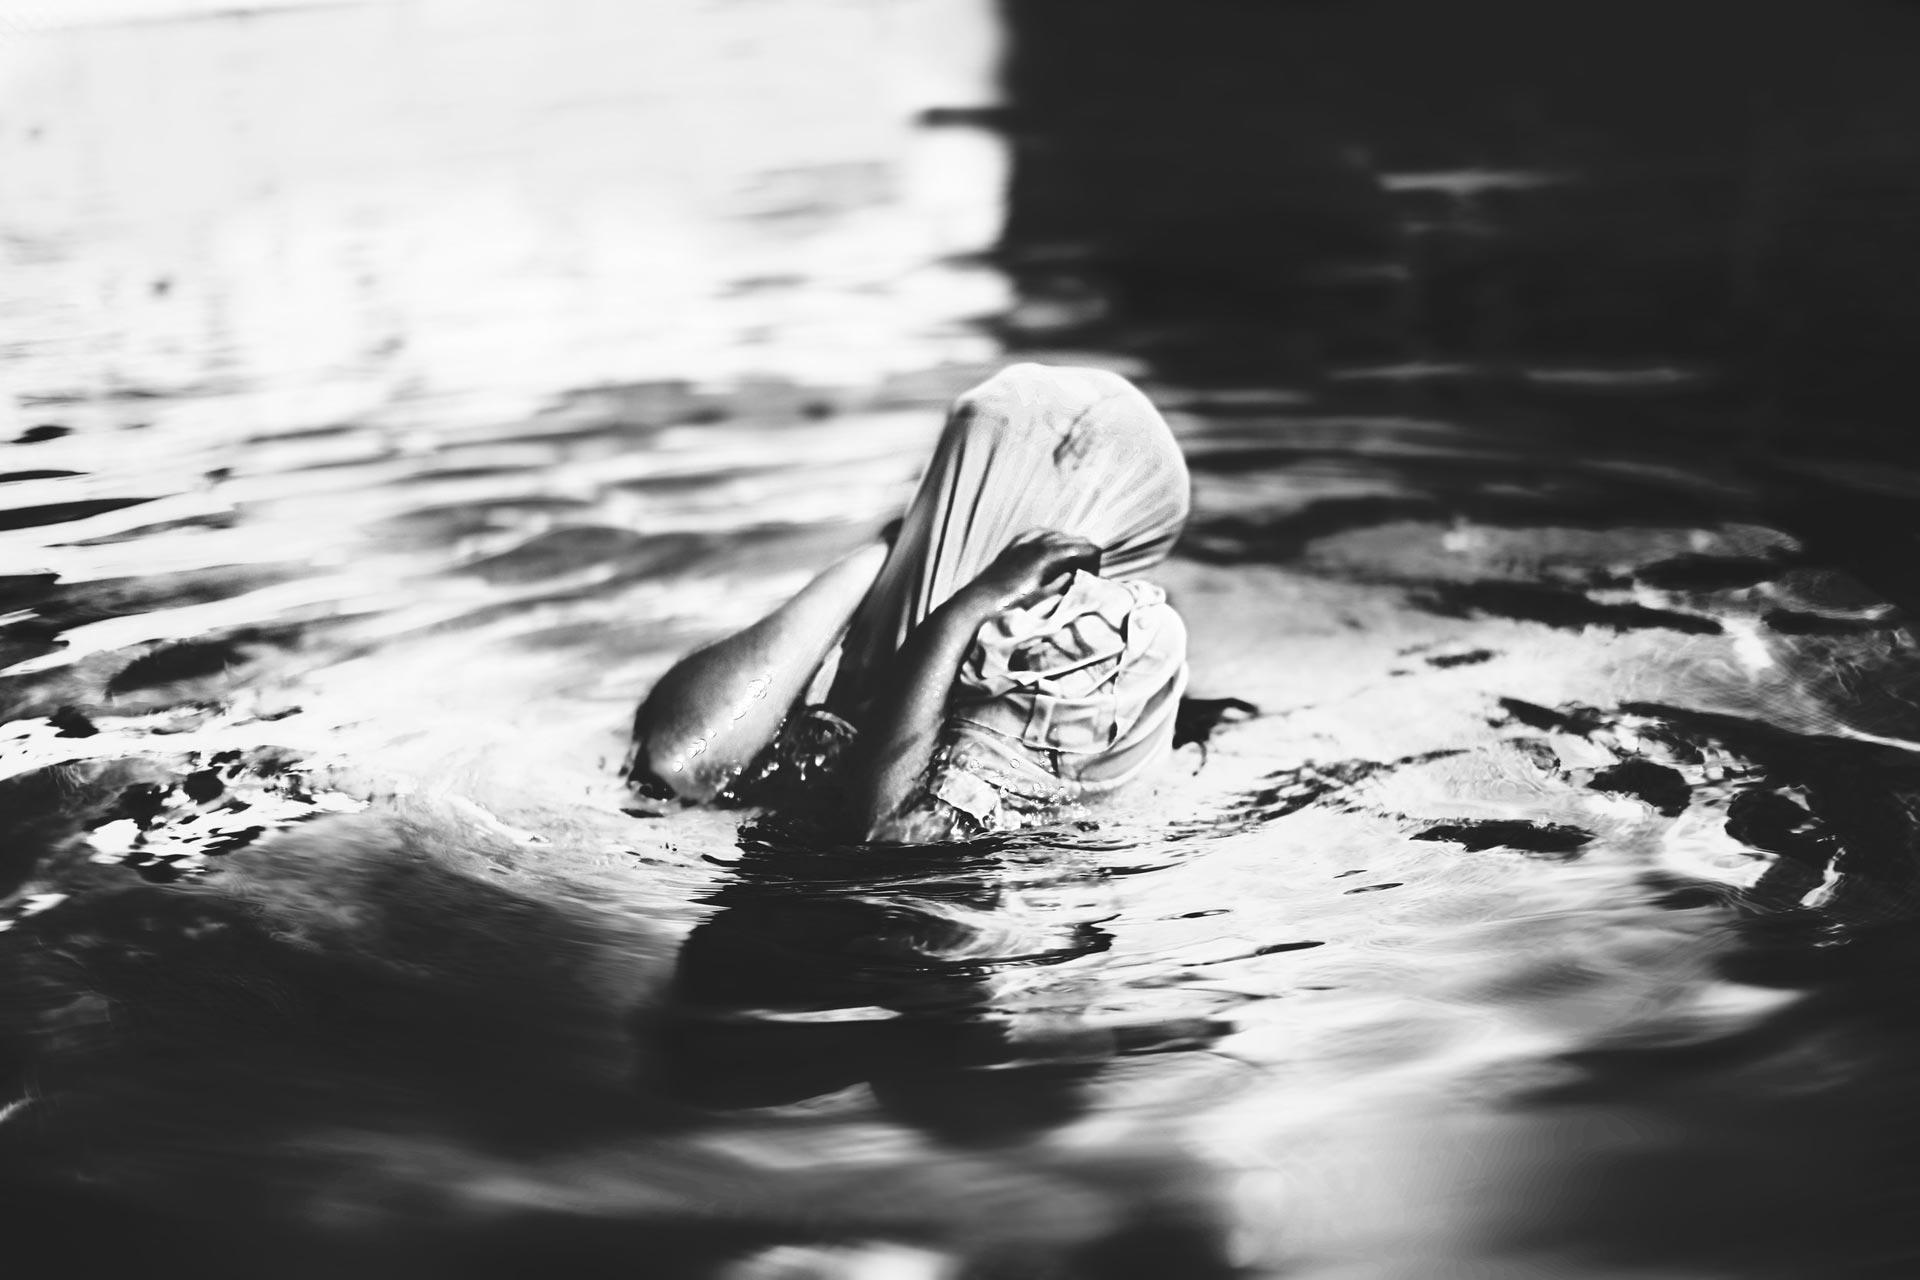 Fotografías de Silvia Grav